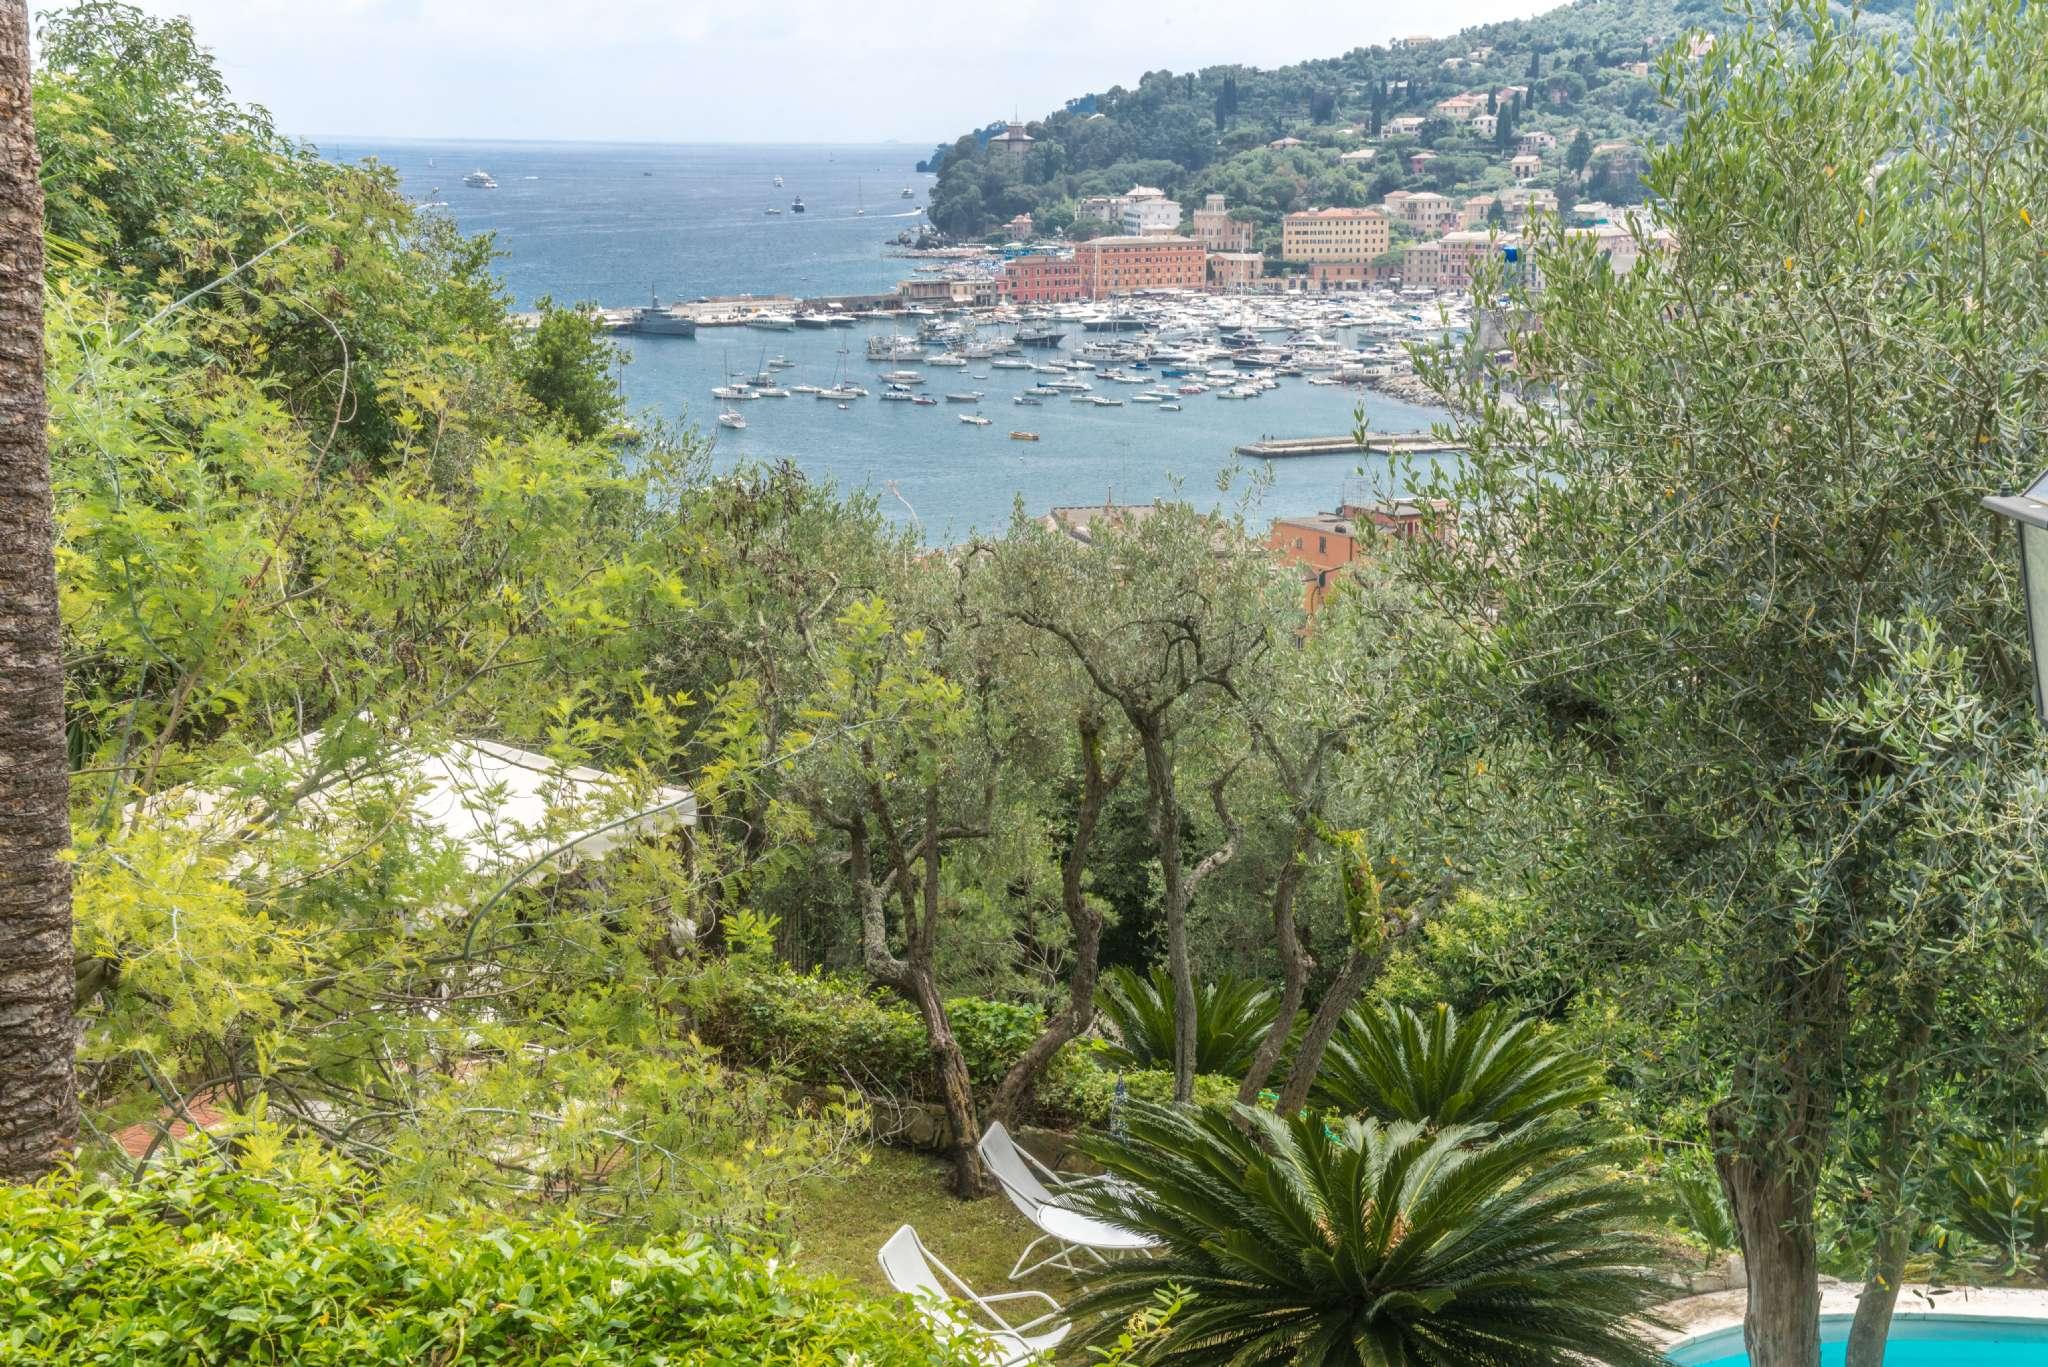 Villa in Vendita a Santa Margherita Ligure: 0 locali, 530 mq - Foto 5